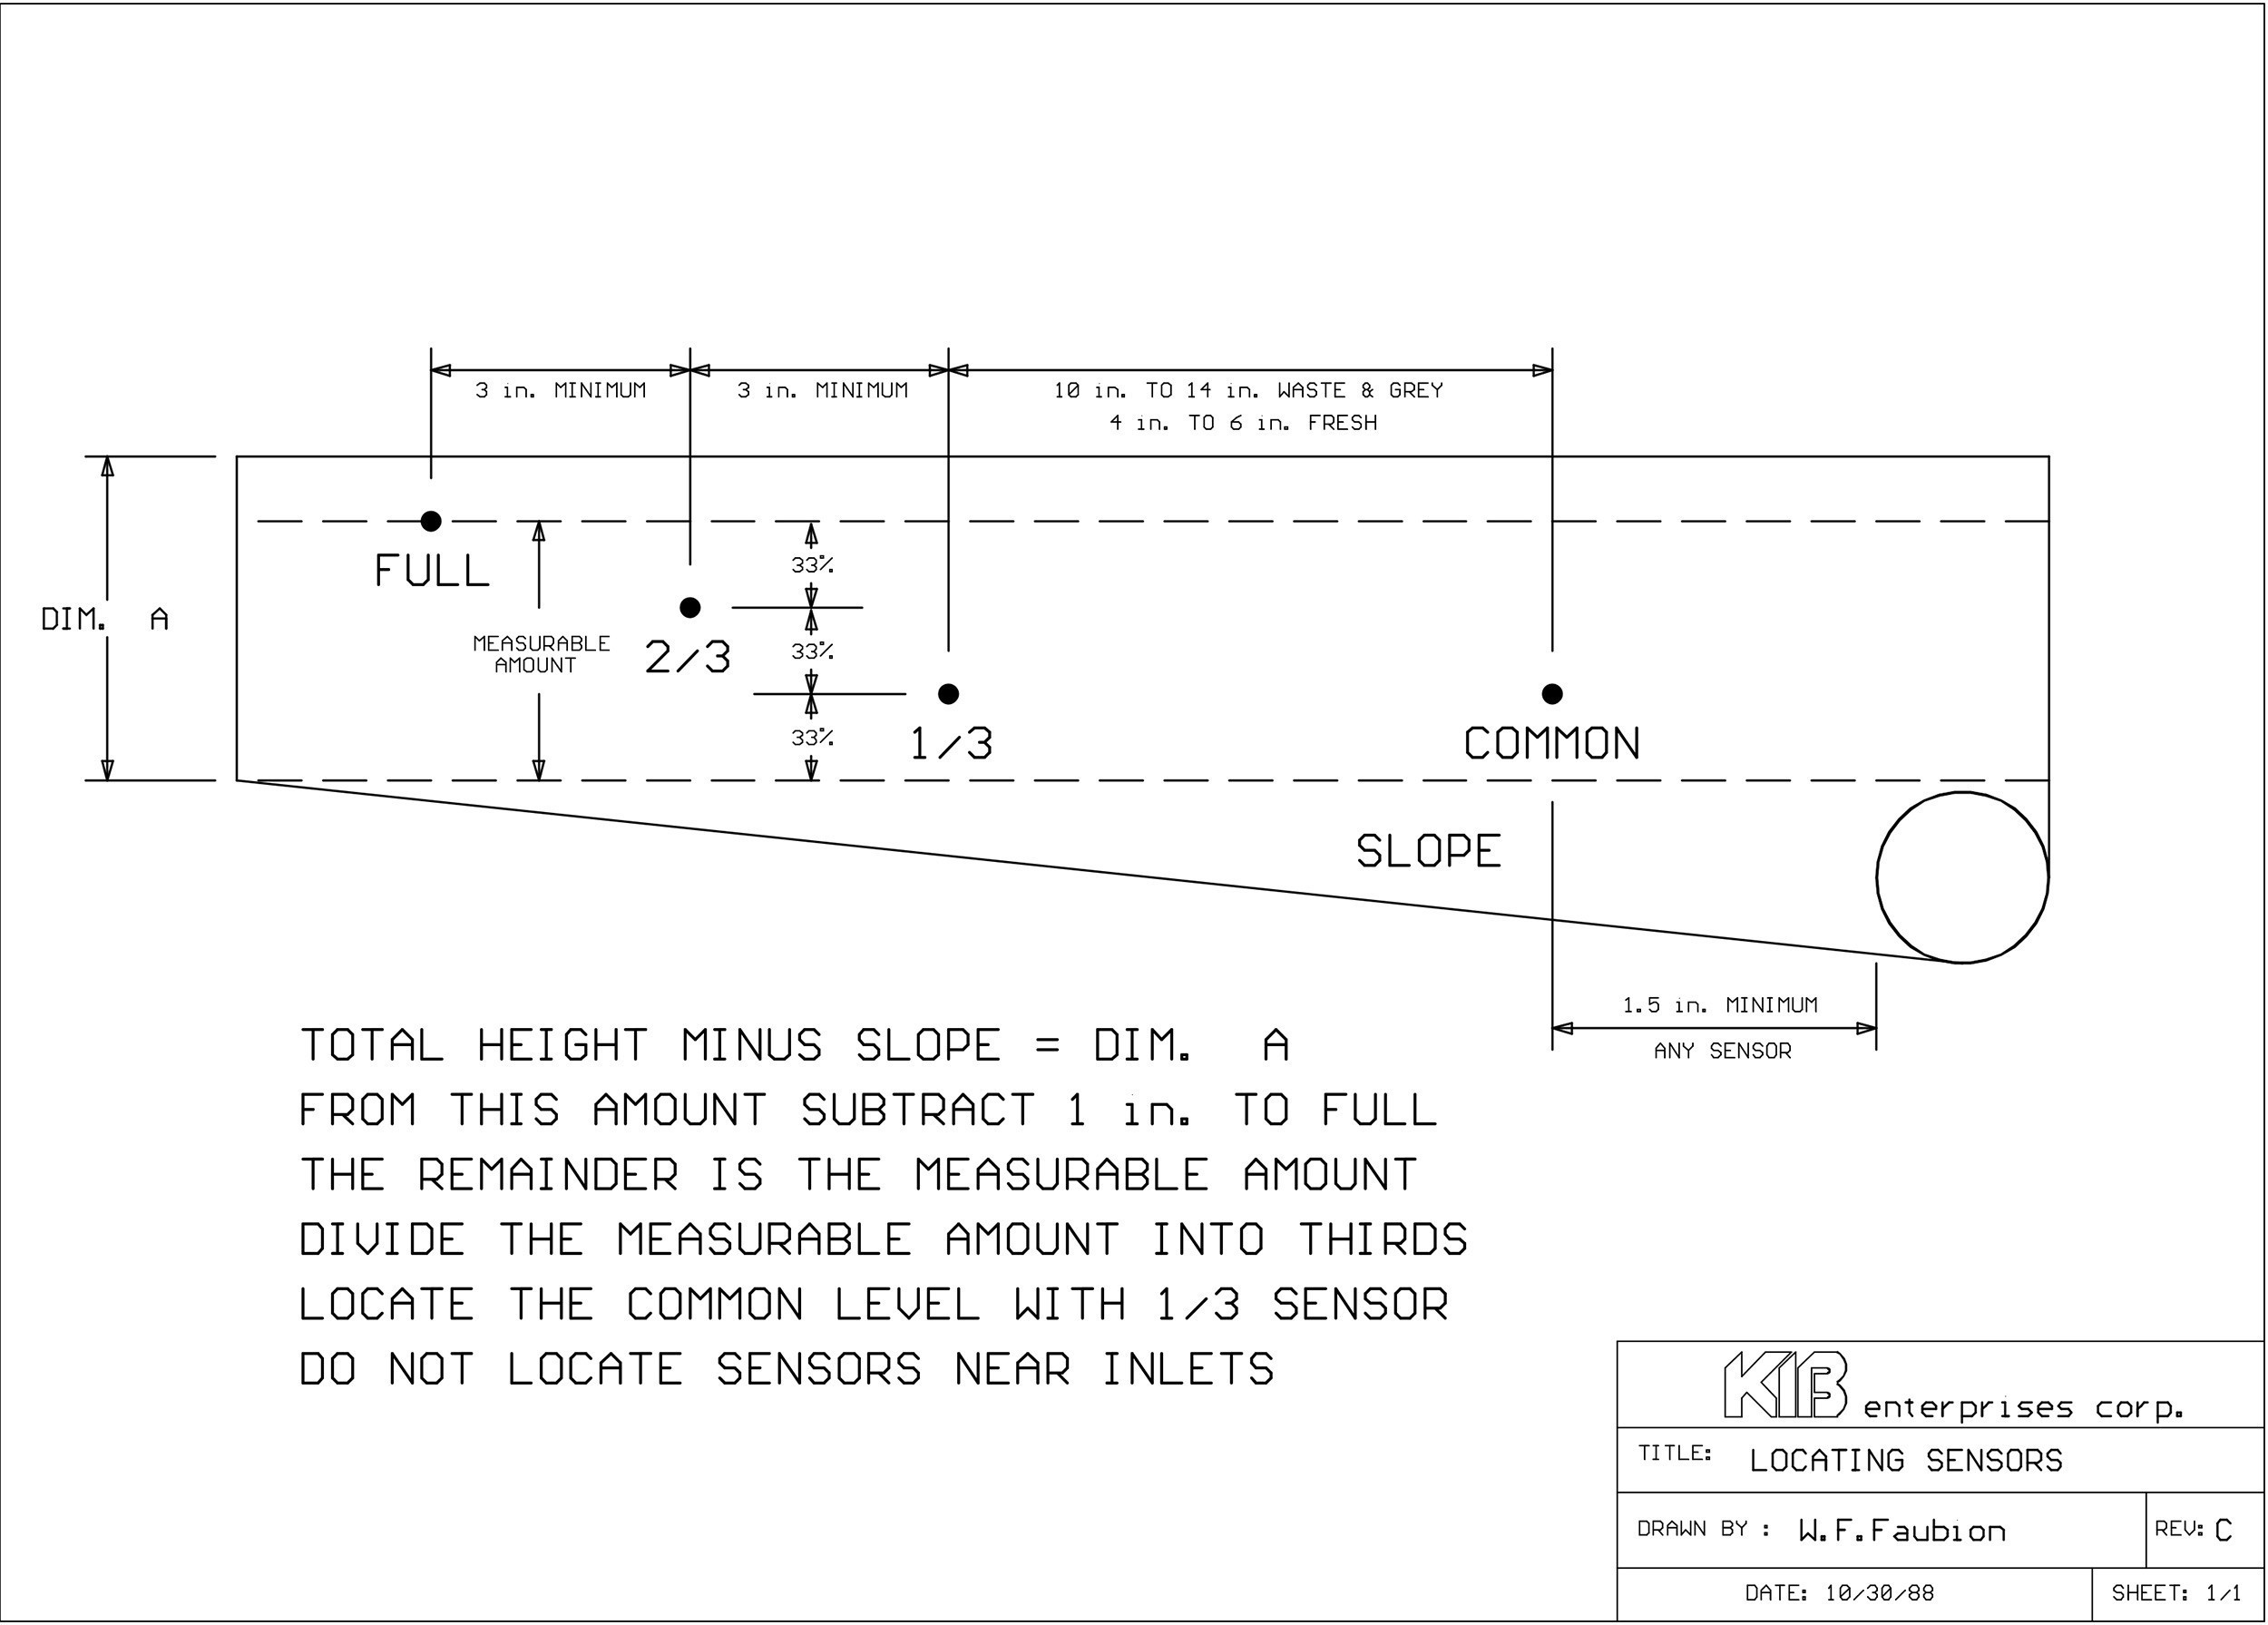 rv holding tank sensor wiring diagram new wiring diagrams archives page 15 of 38 gidn of rv holding tank sensor wiring diagram